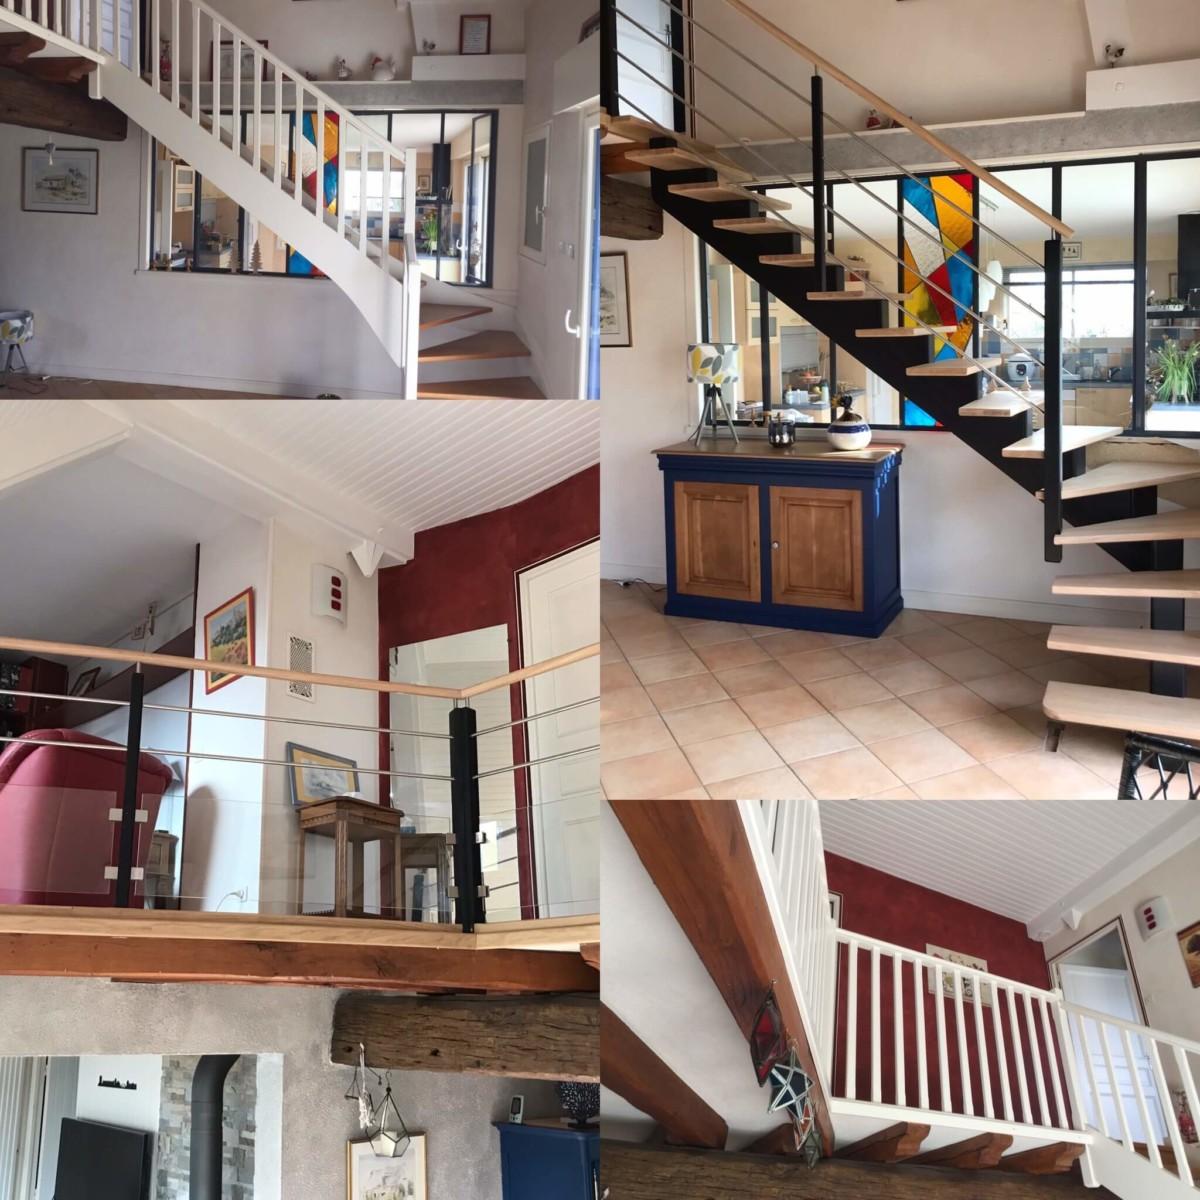 REGIS BERTHELOT Fabricant Escaliers Longue Jumelles IMG 0932